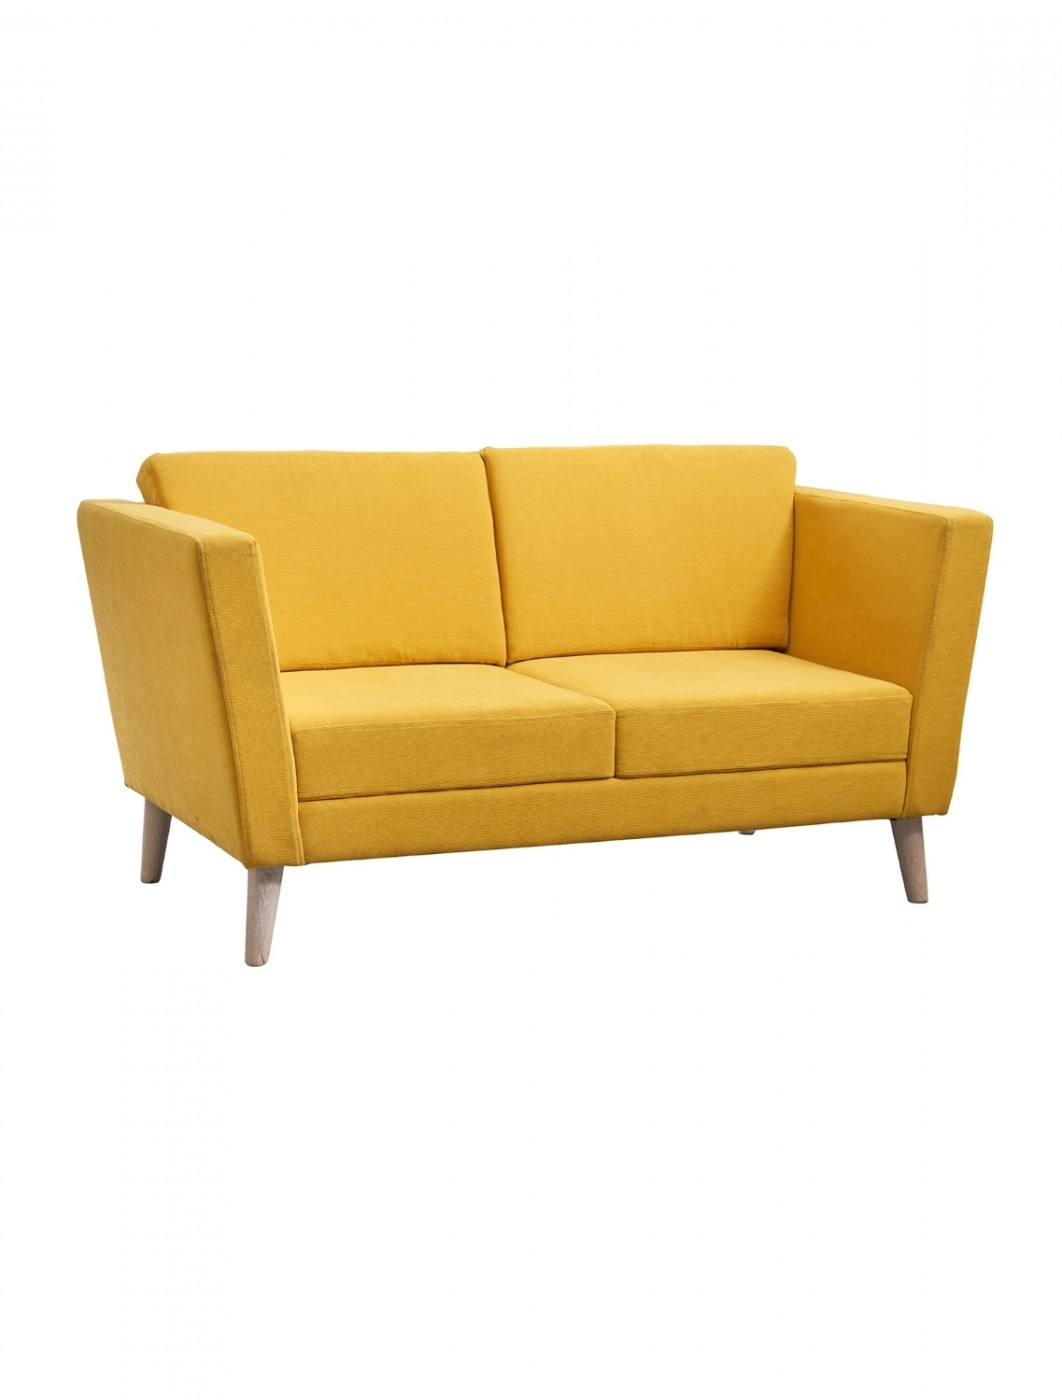 Dams Lyric Reception Seating 2 Seater Sofa LYR50002